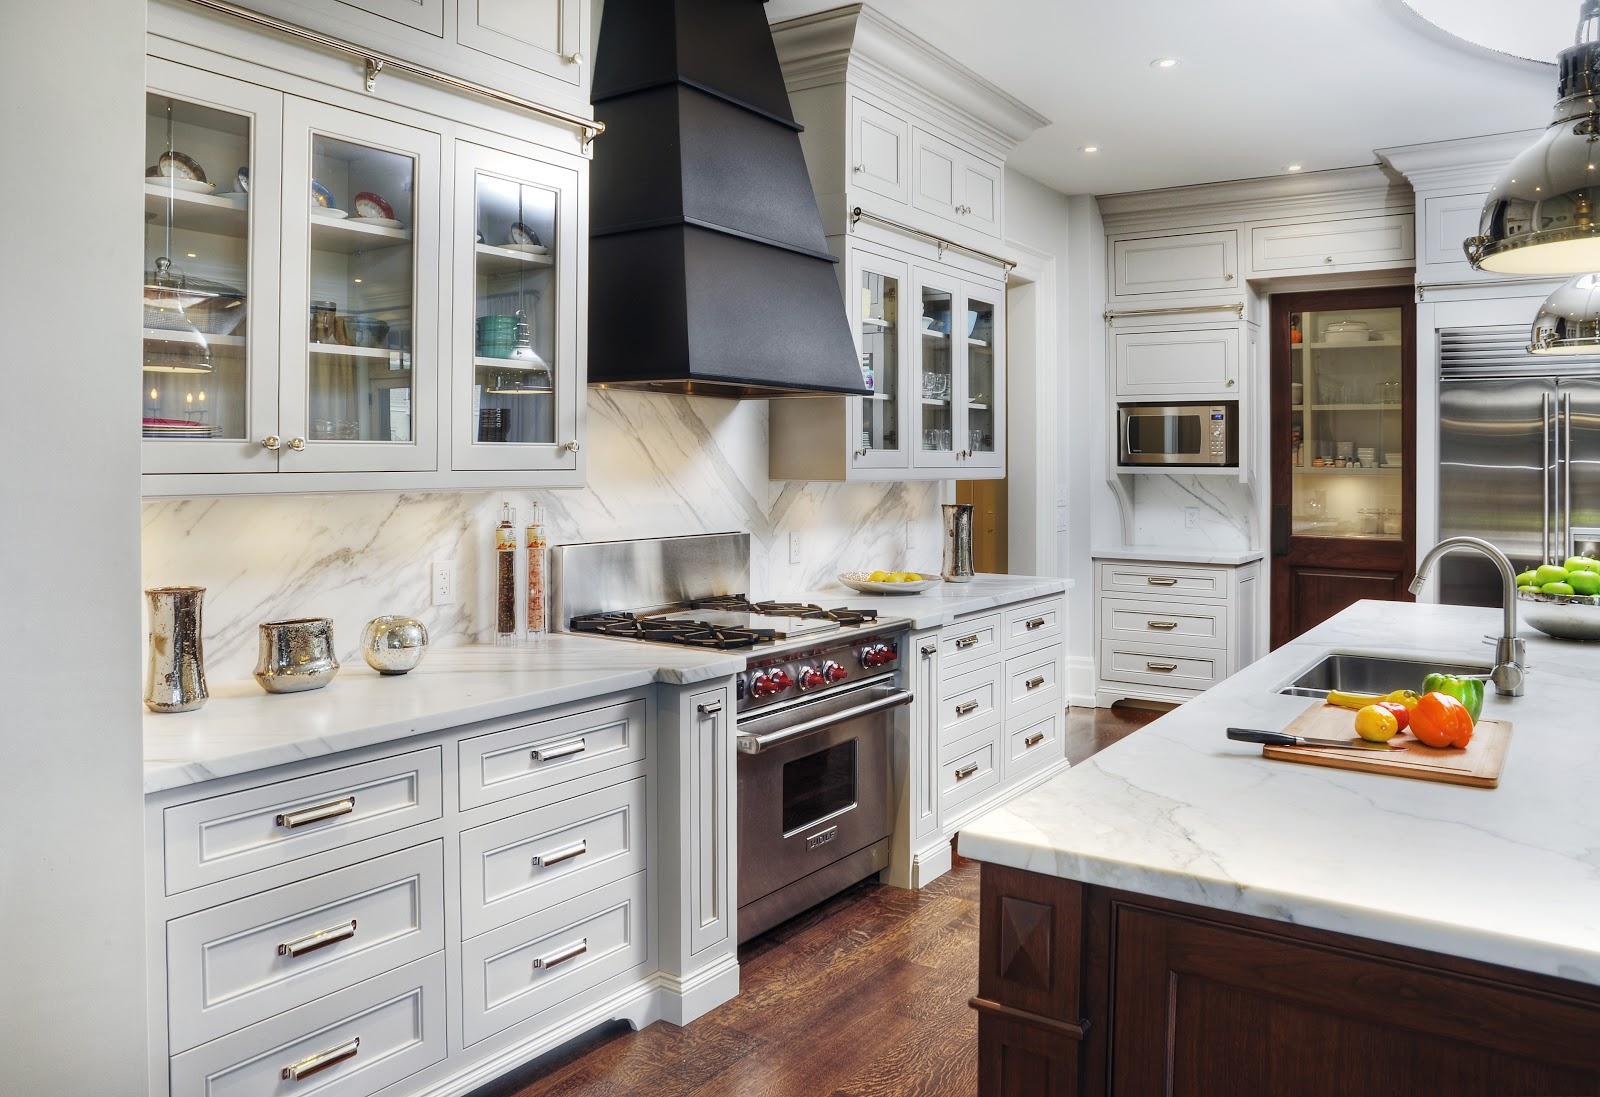 Braam S Custom Cabinets Kitchen Design Contest Subzero And Wolf